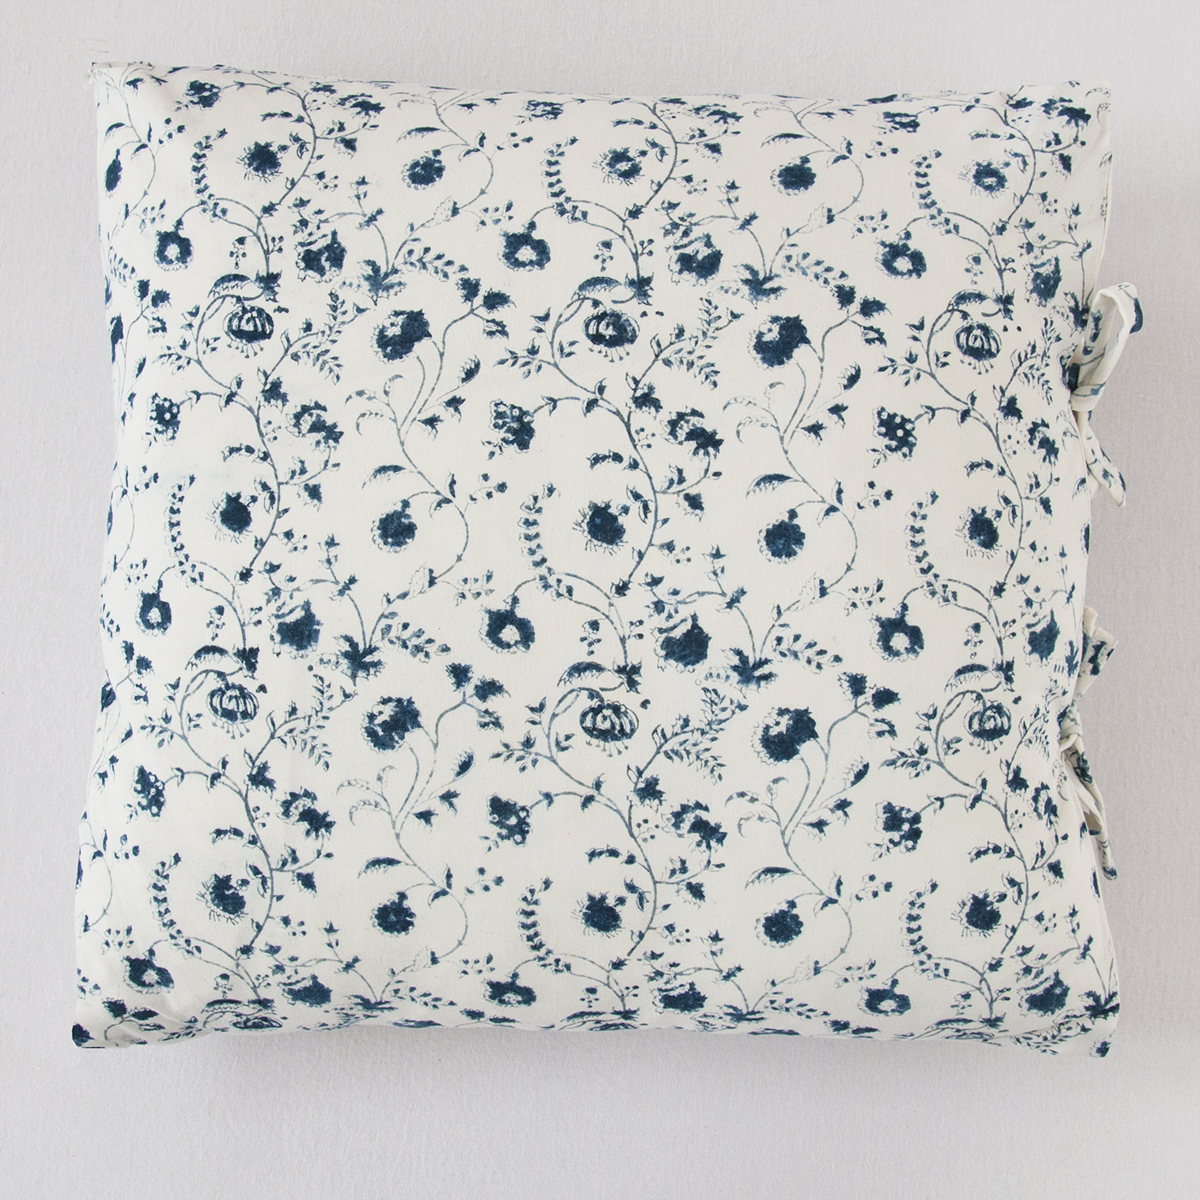 solange small deco pillow les indiennes. Black Bedroom Furniture Sets. Home Design Ideas